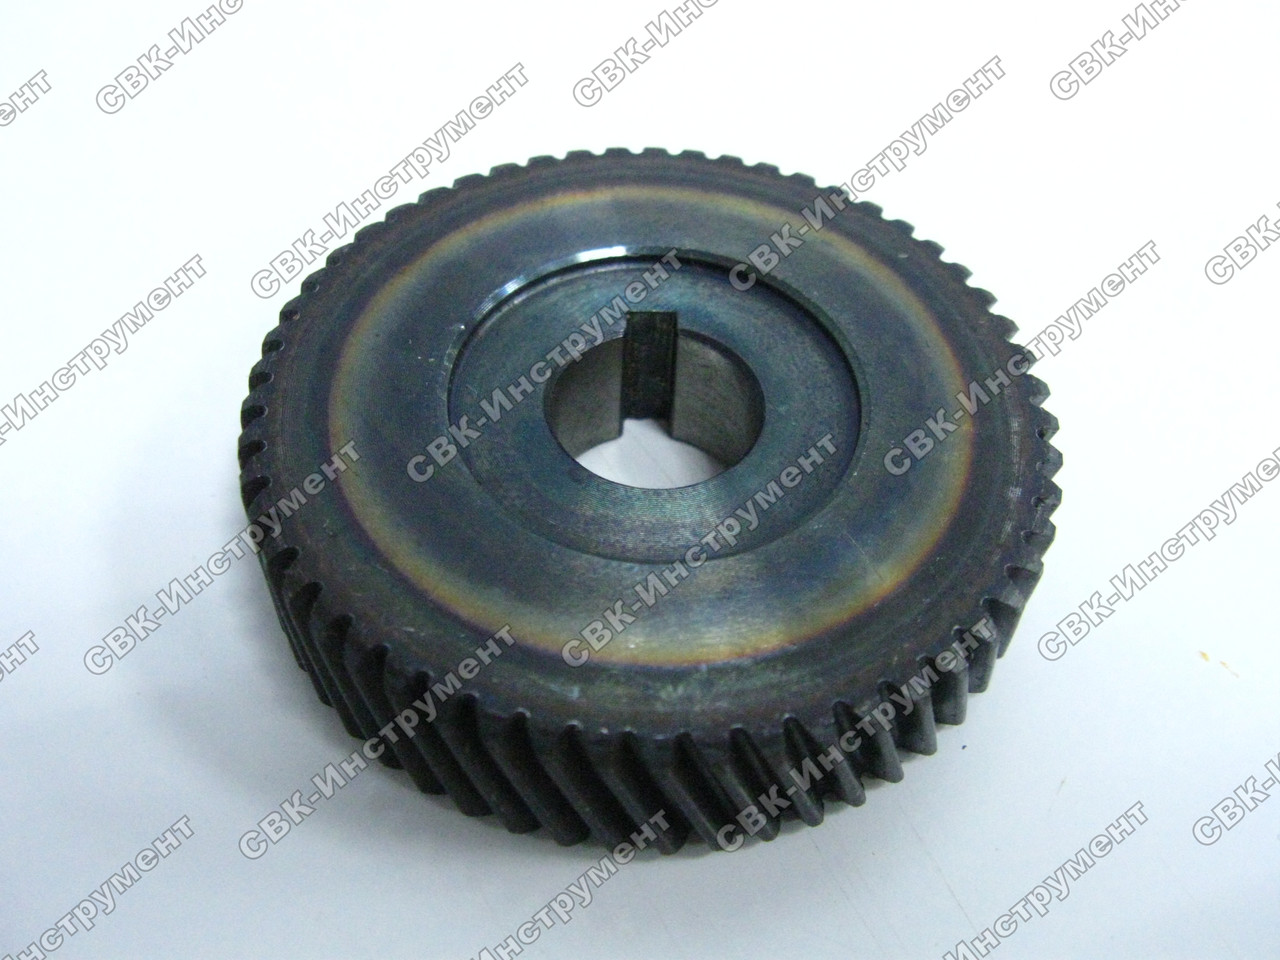 Шестерня дисковой пилы 12х47 54z